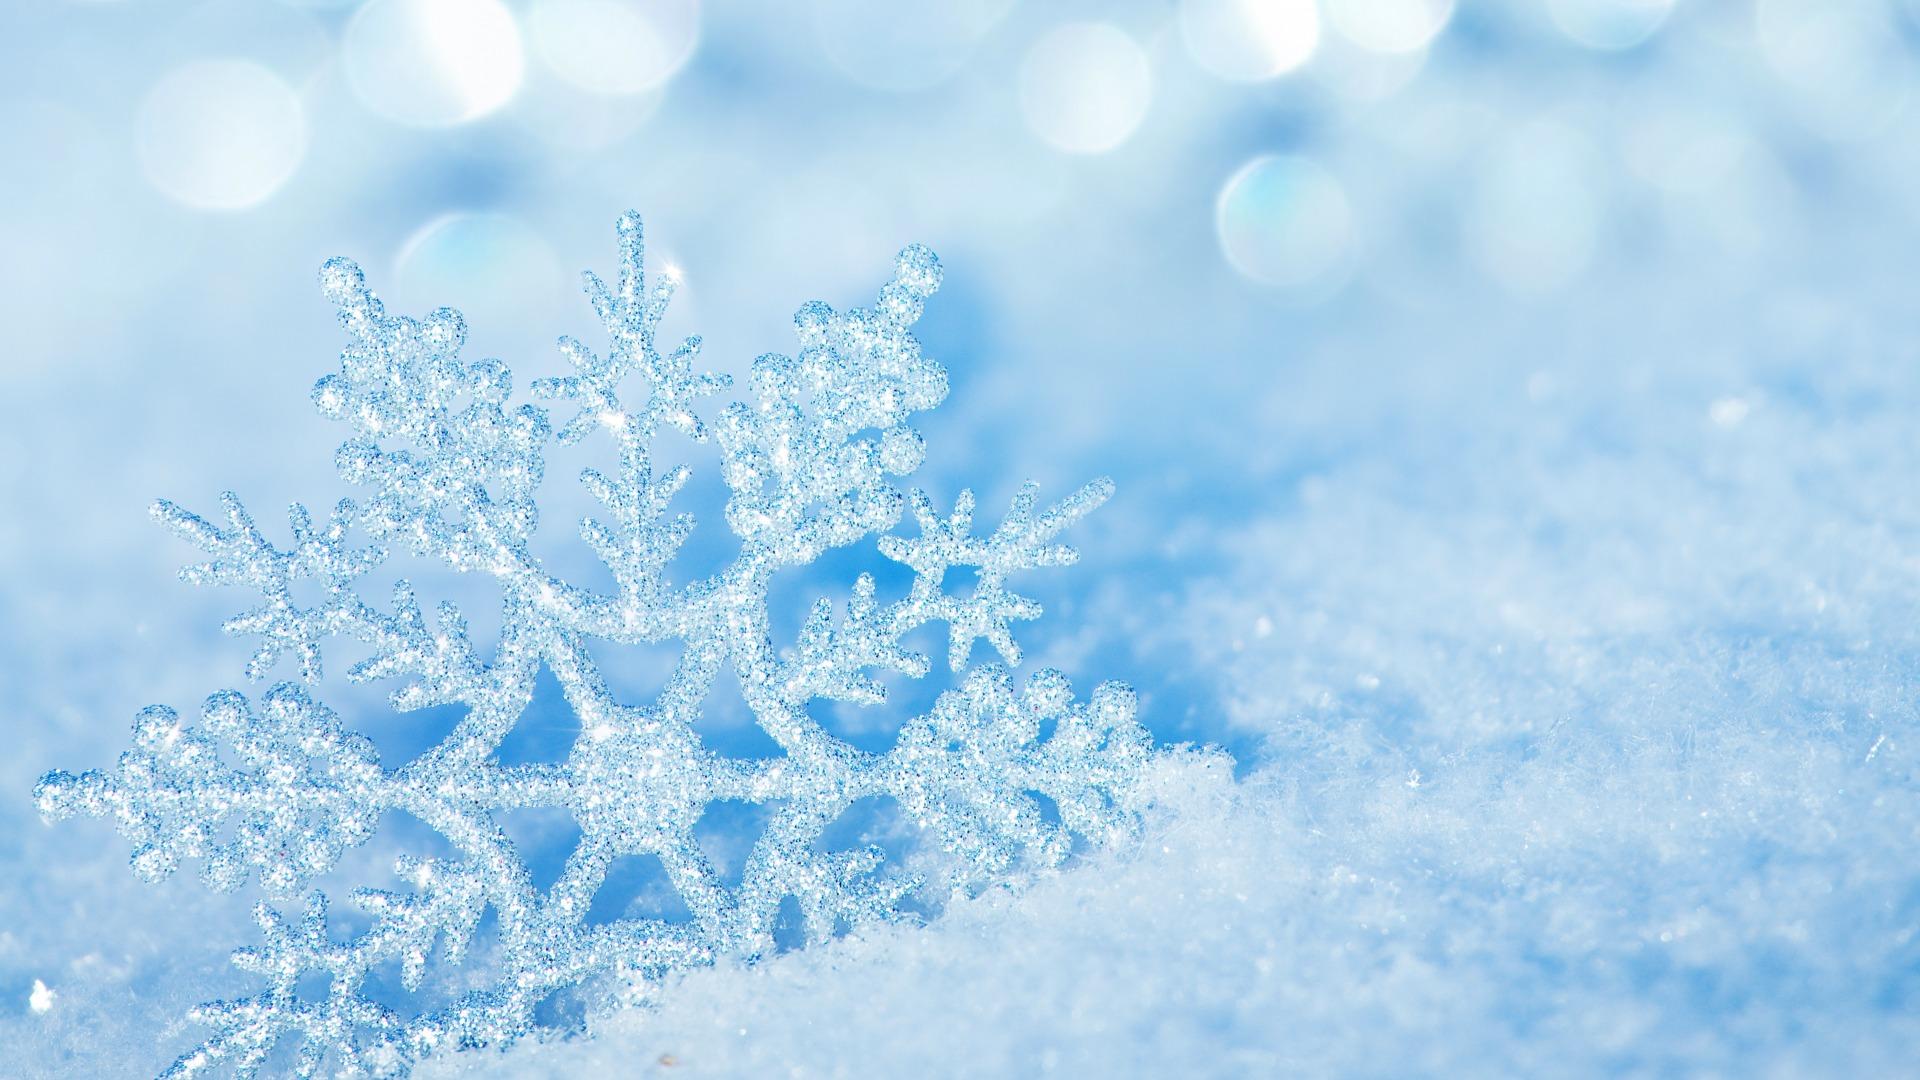 Снежинки фотообои на рабочий стол